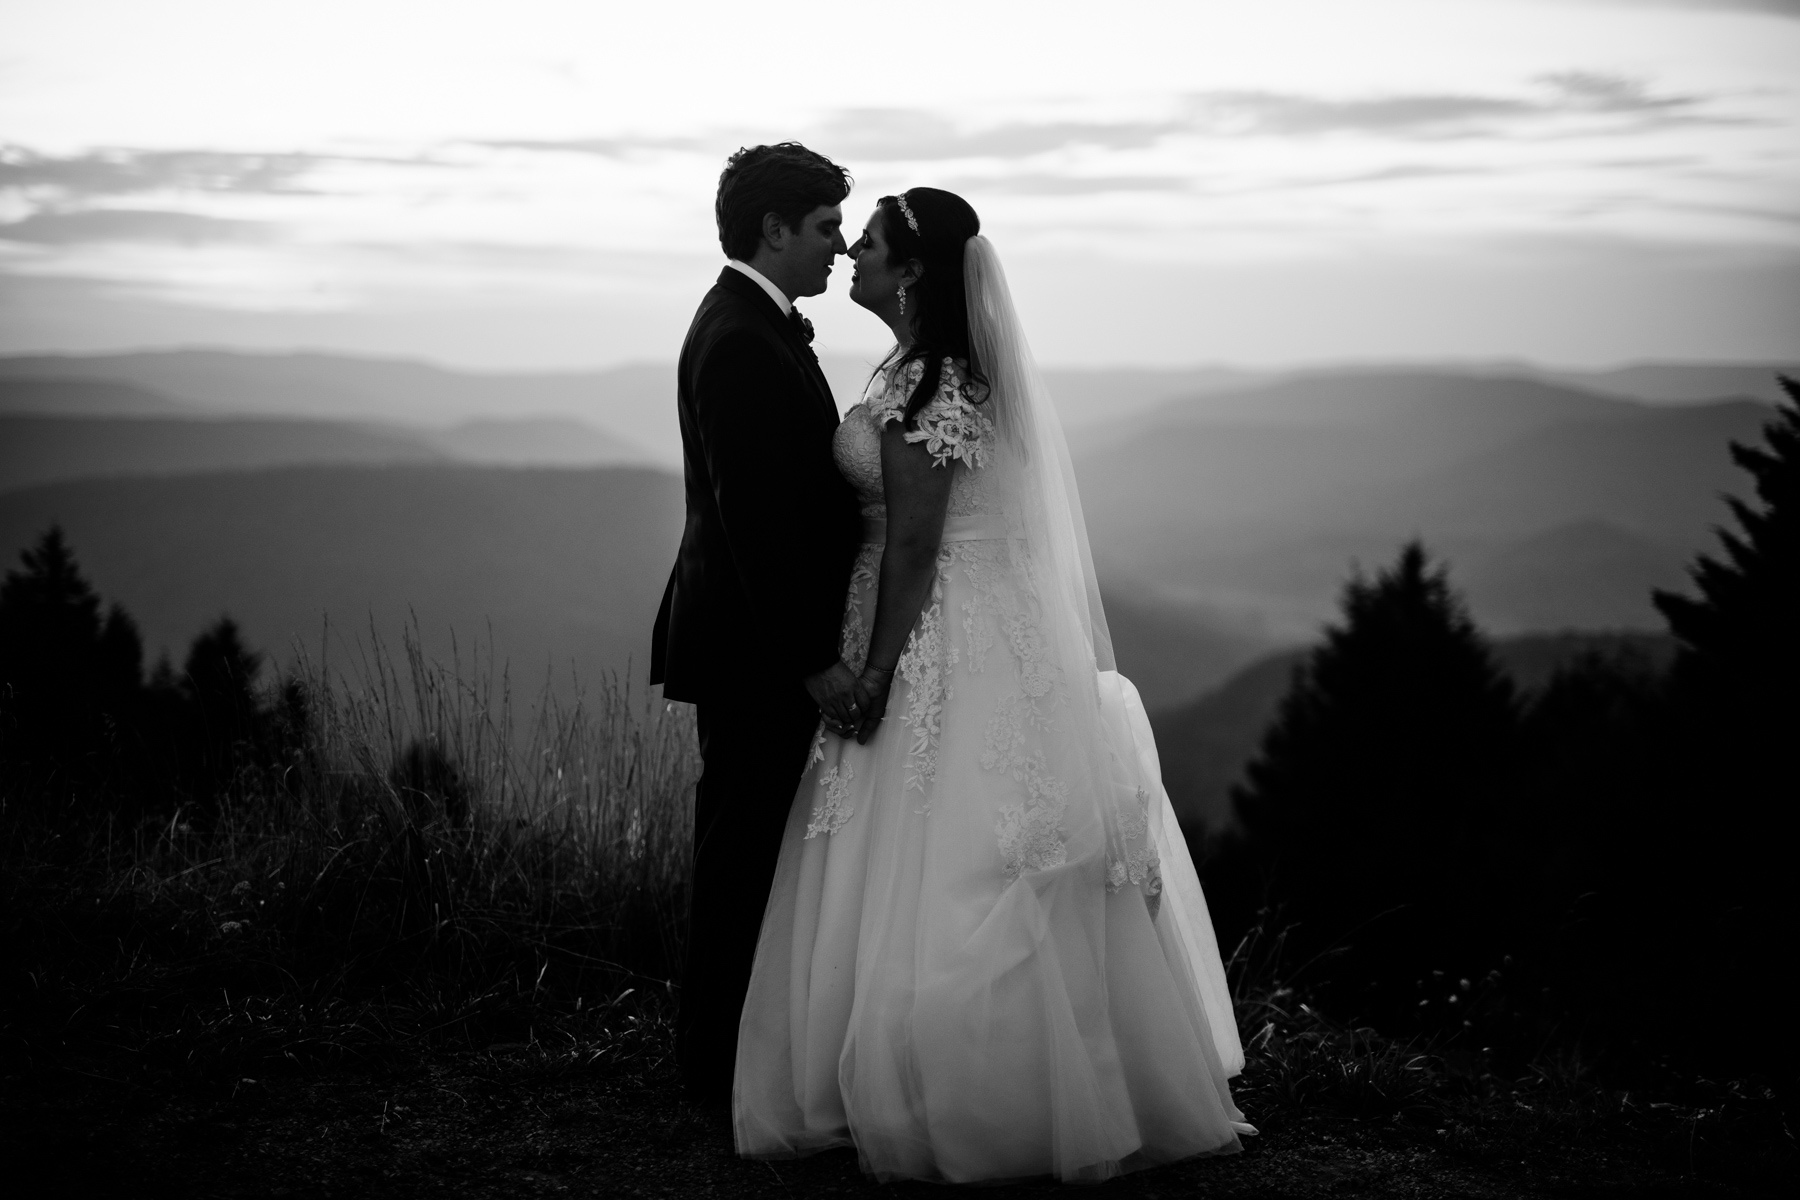 couples portrait on mountain